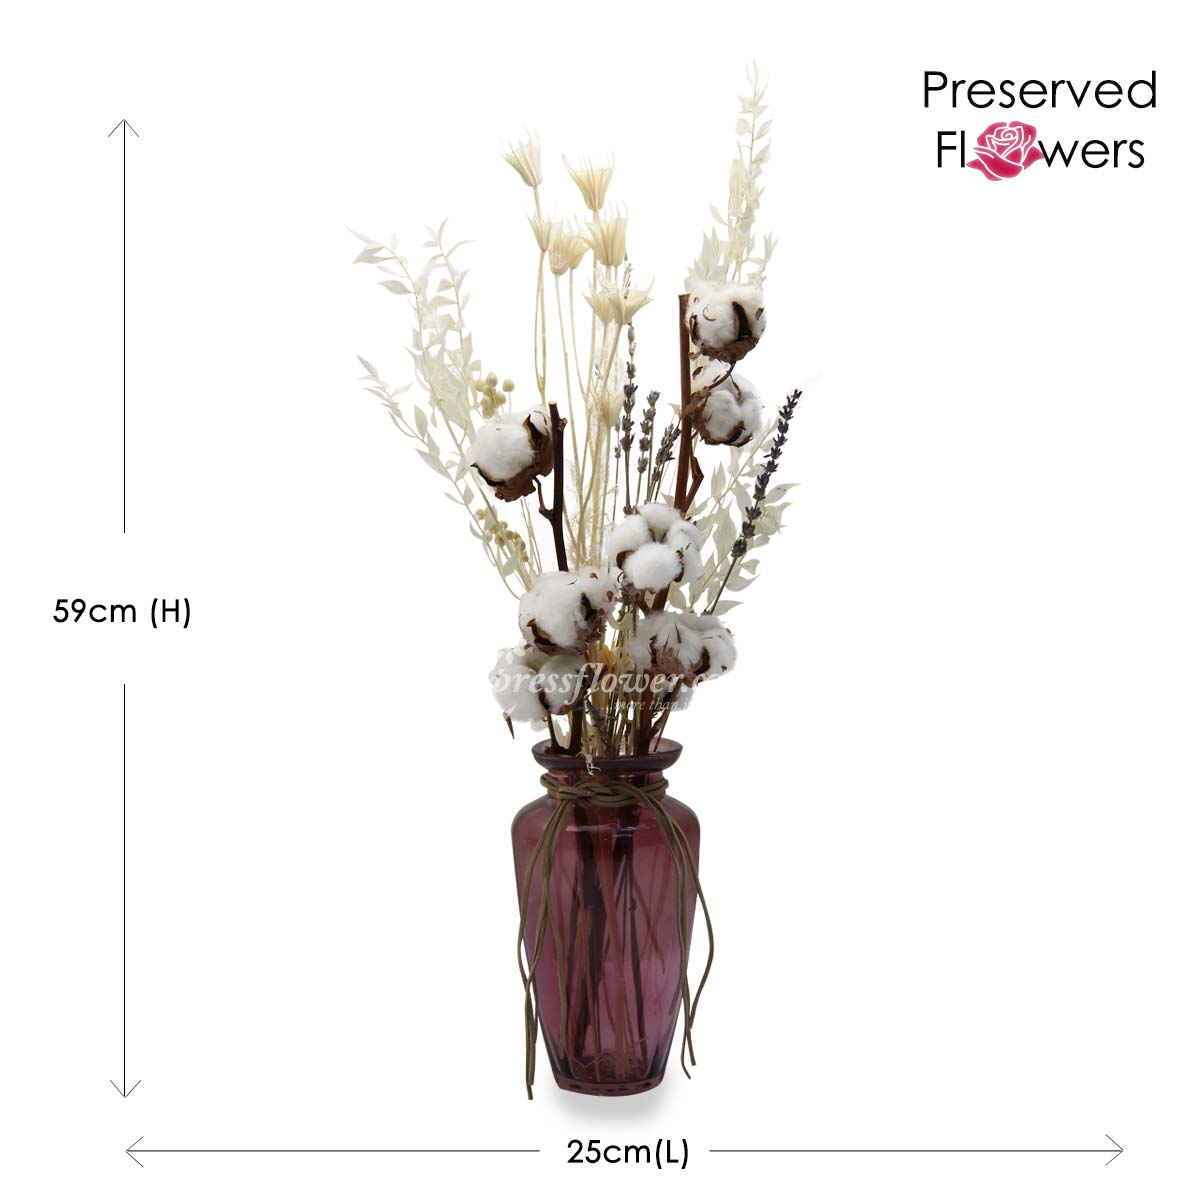 PR2109_Perfectly Splendid (Dried Flowers)_C